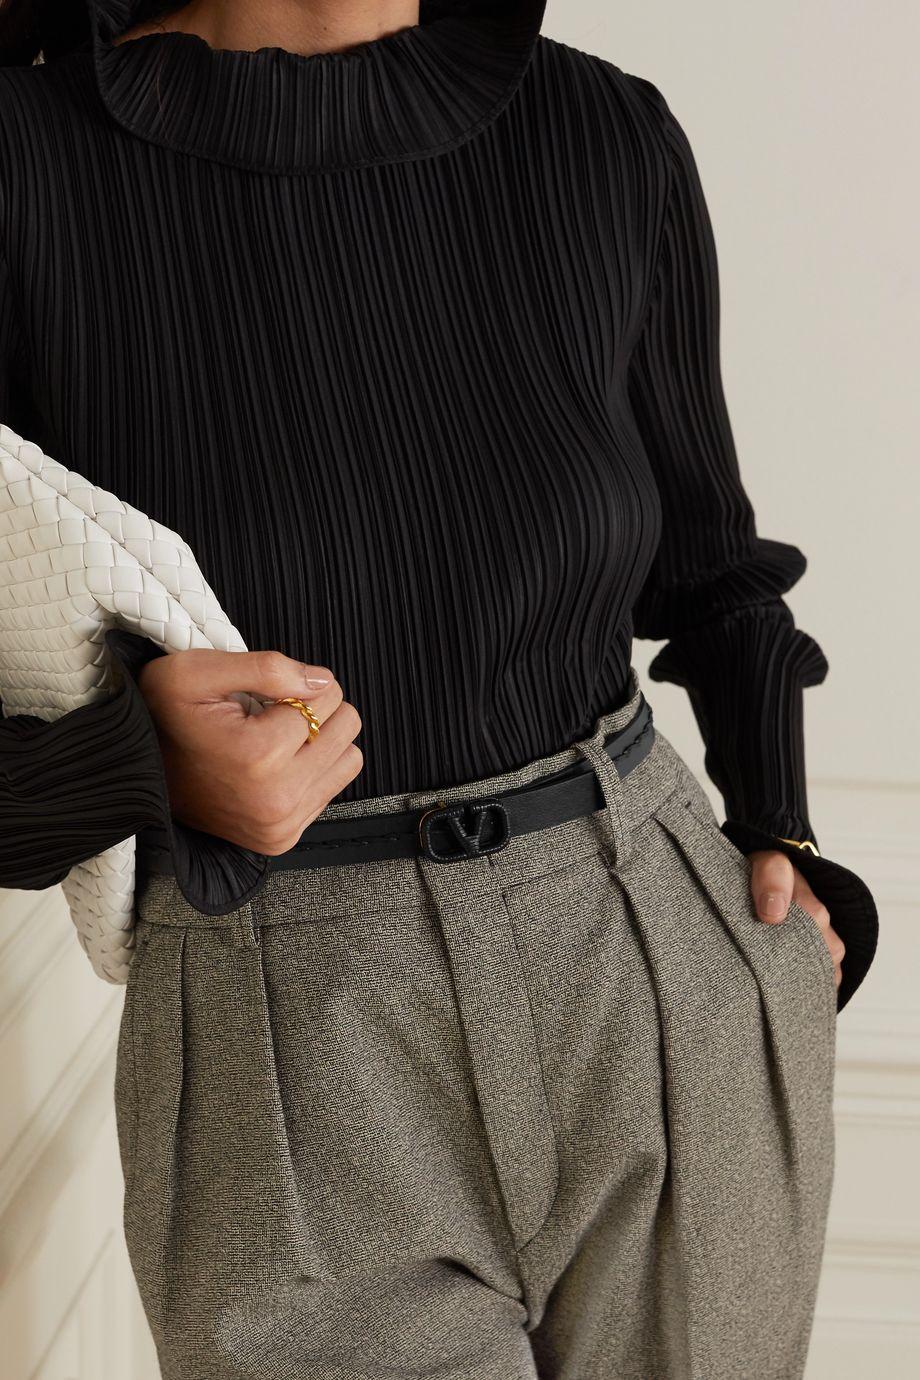 Valentino Valentino Garavani leather belt